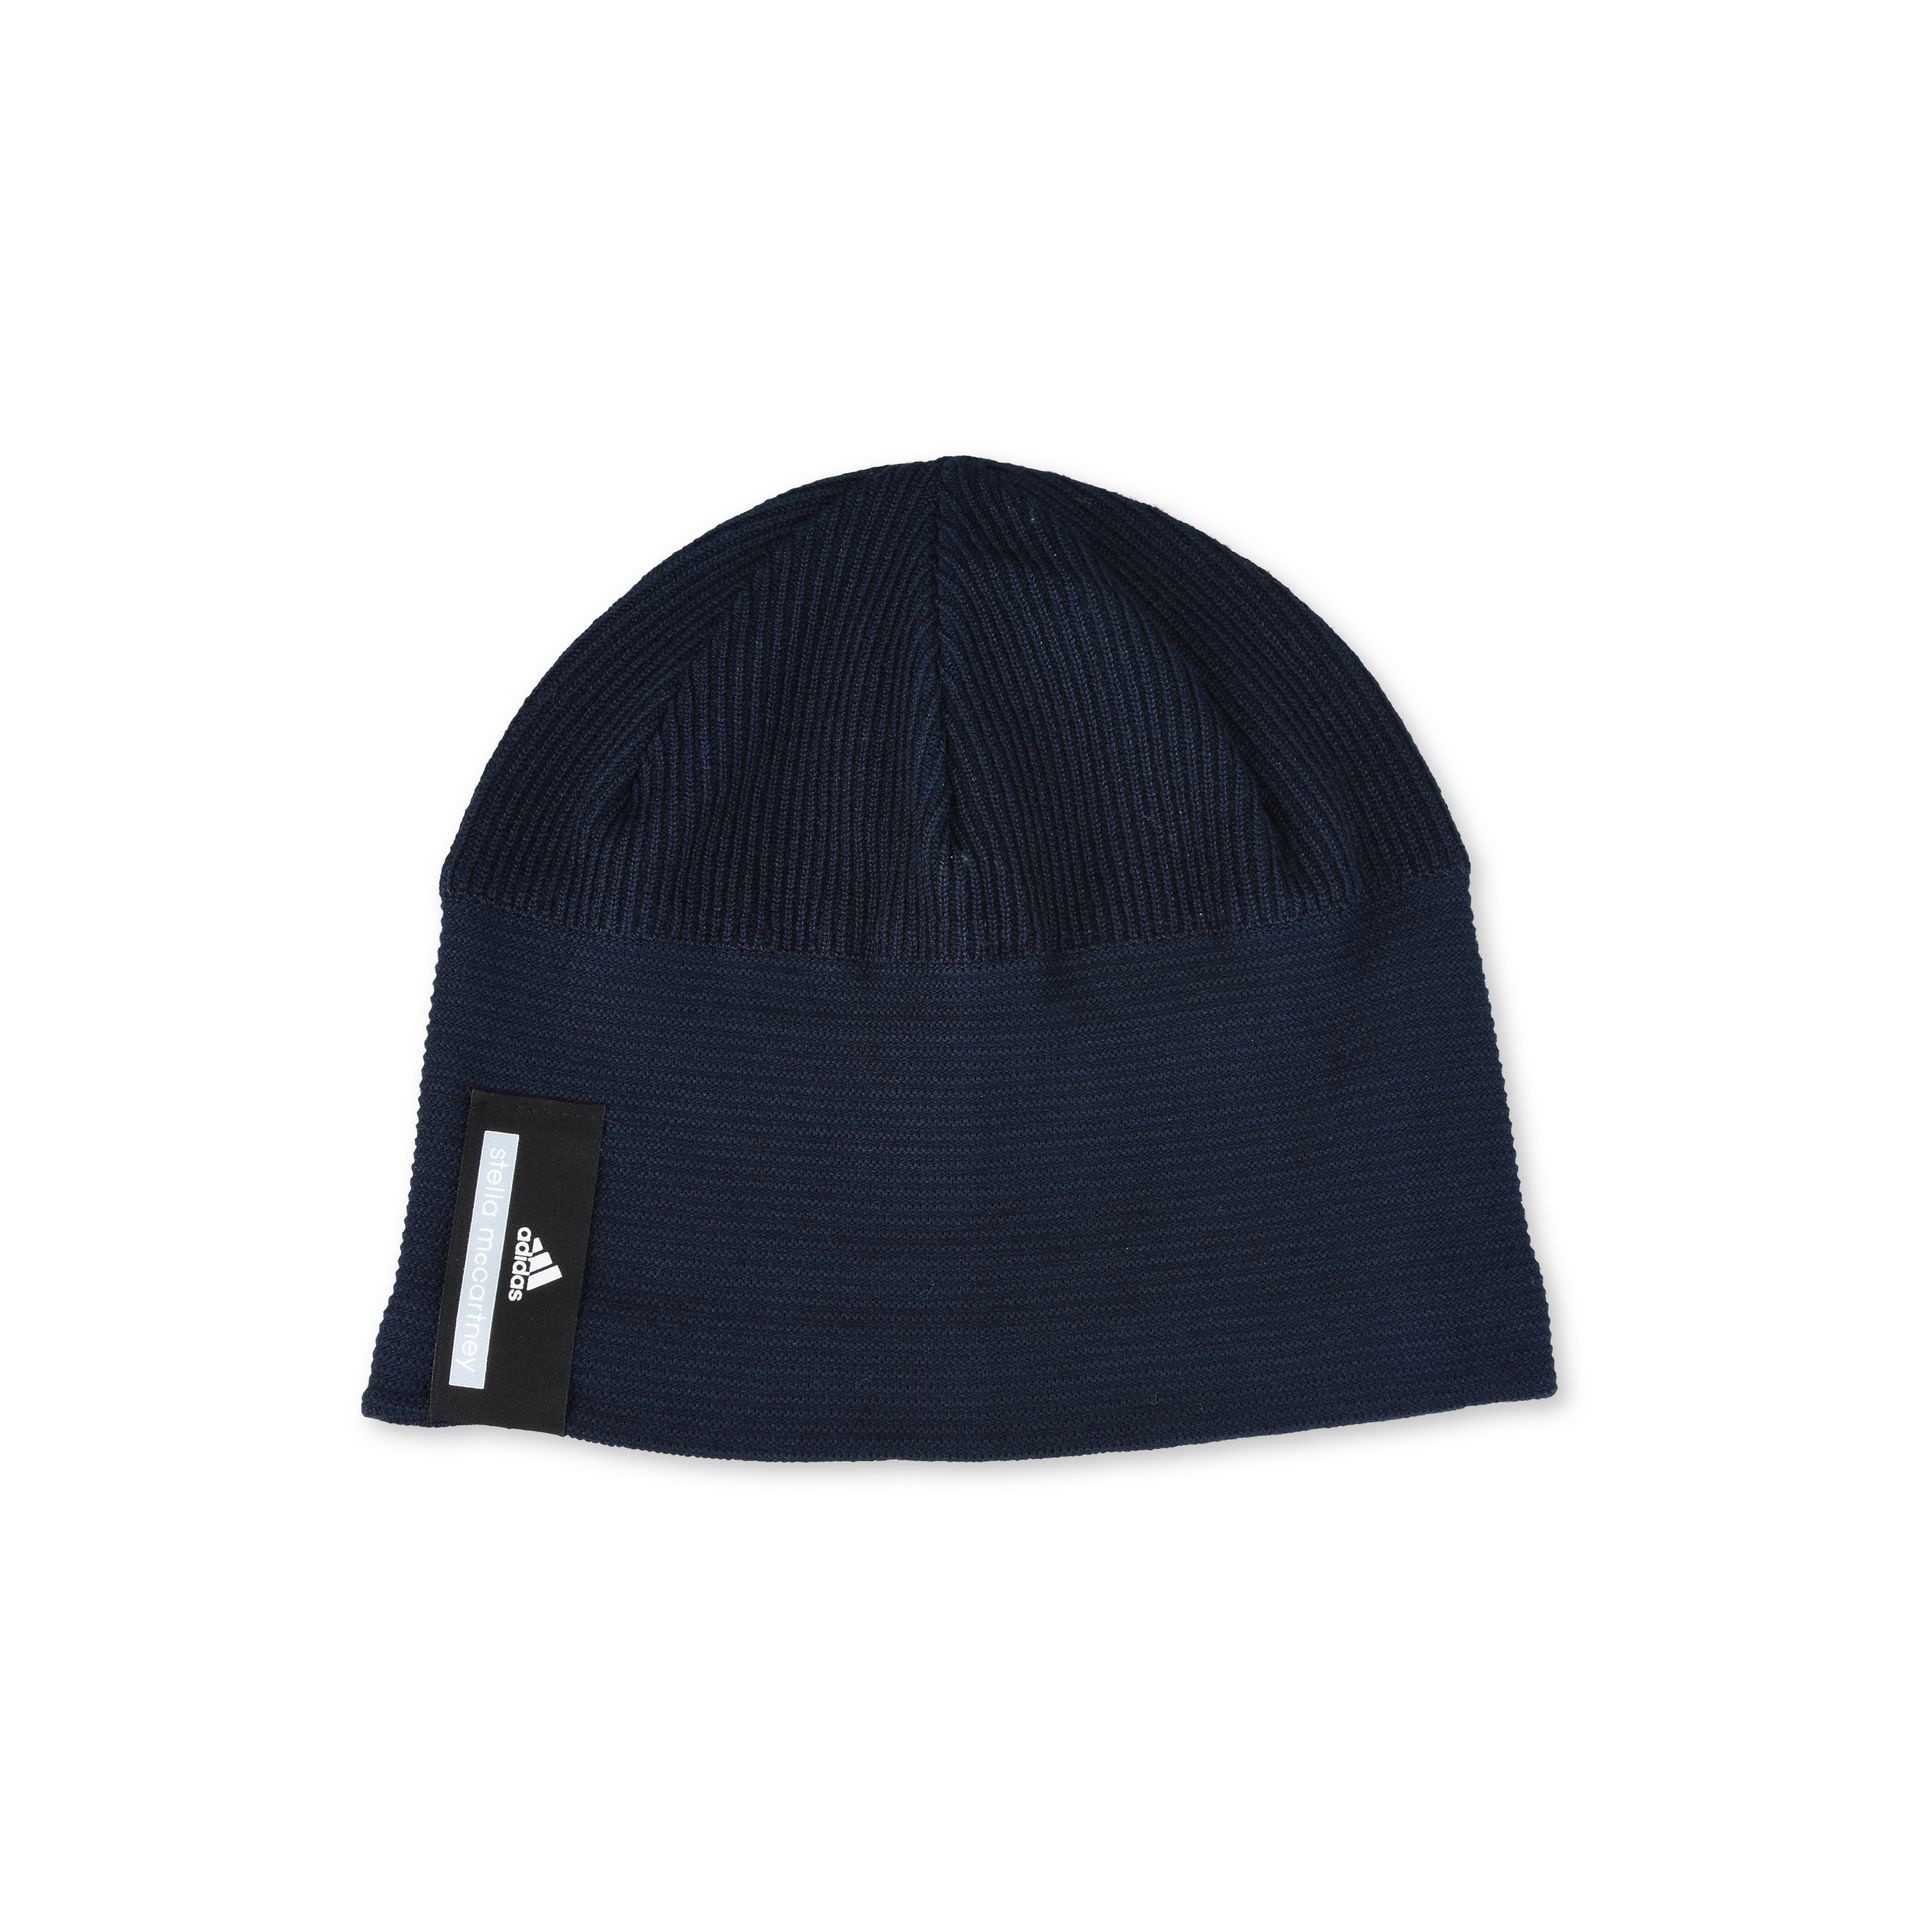 0544c9d54a51d Adidas Stella Mccartney Ski Hat